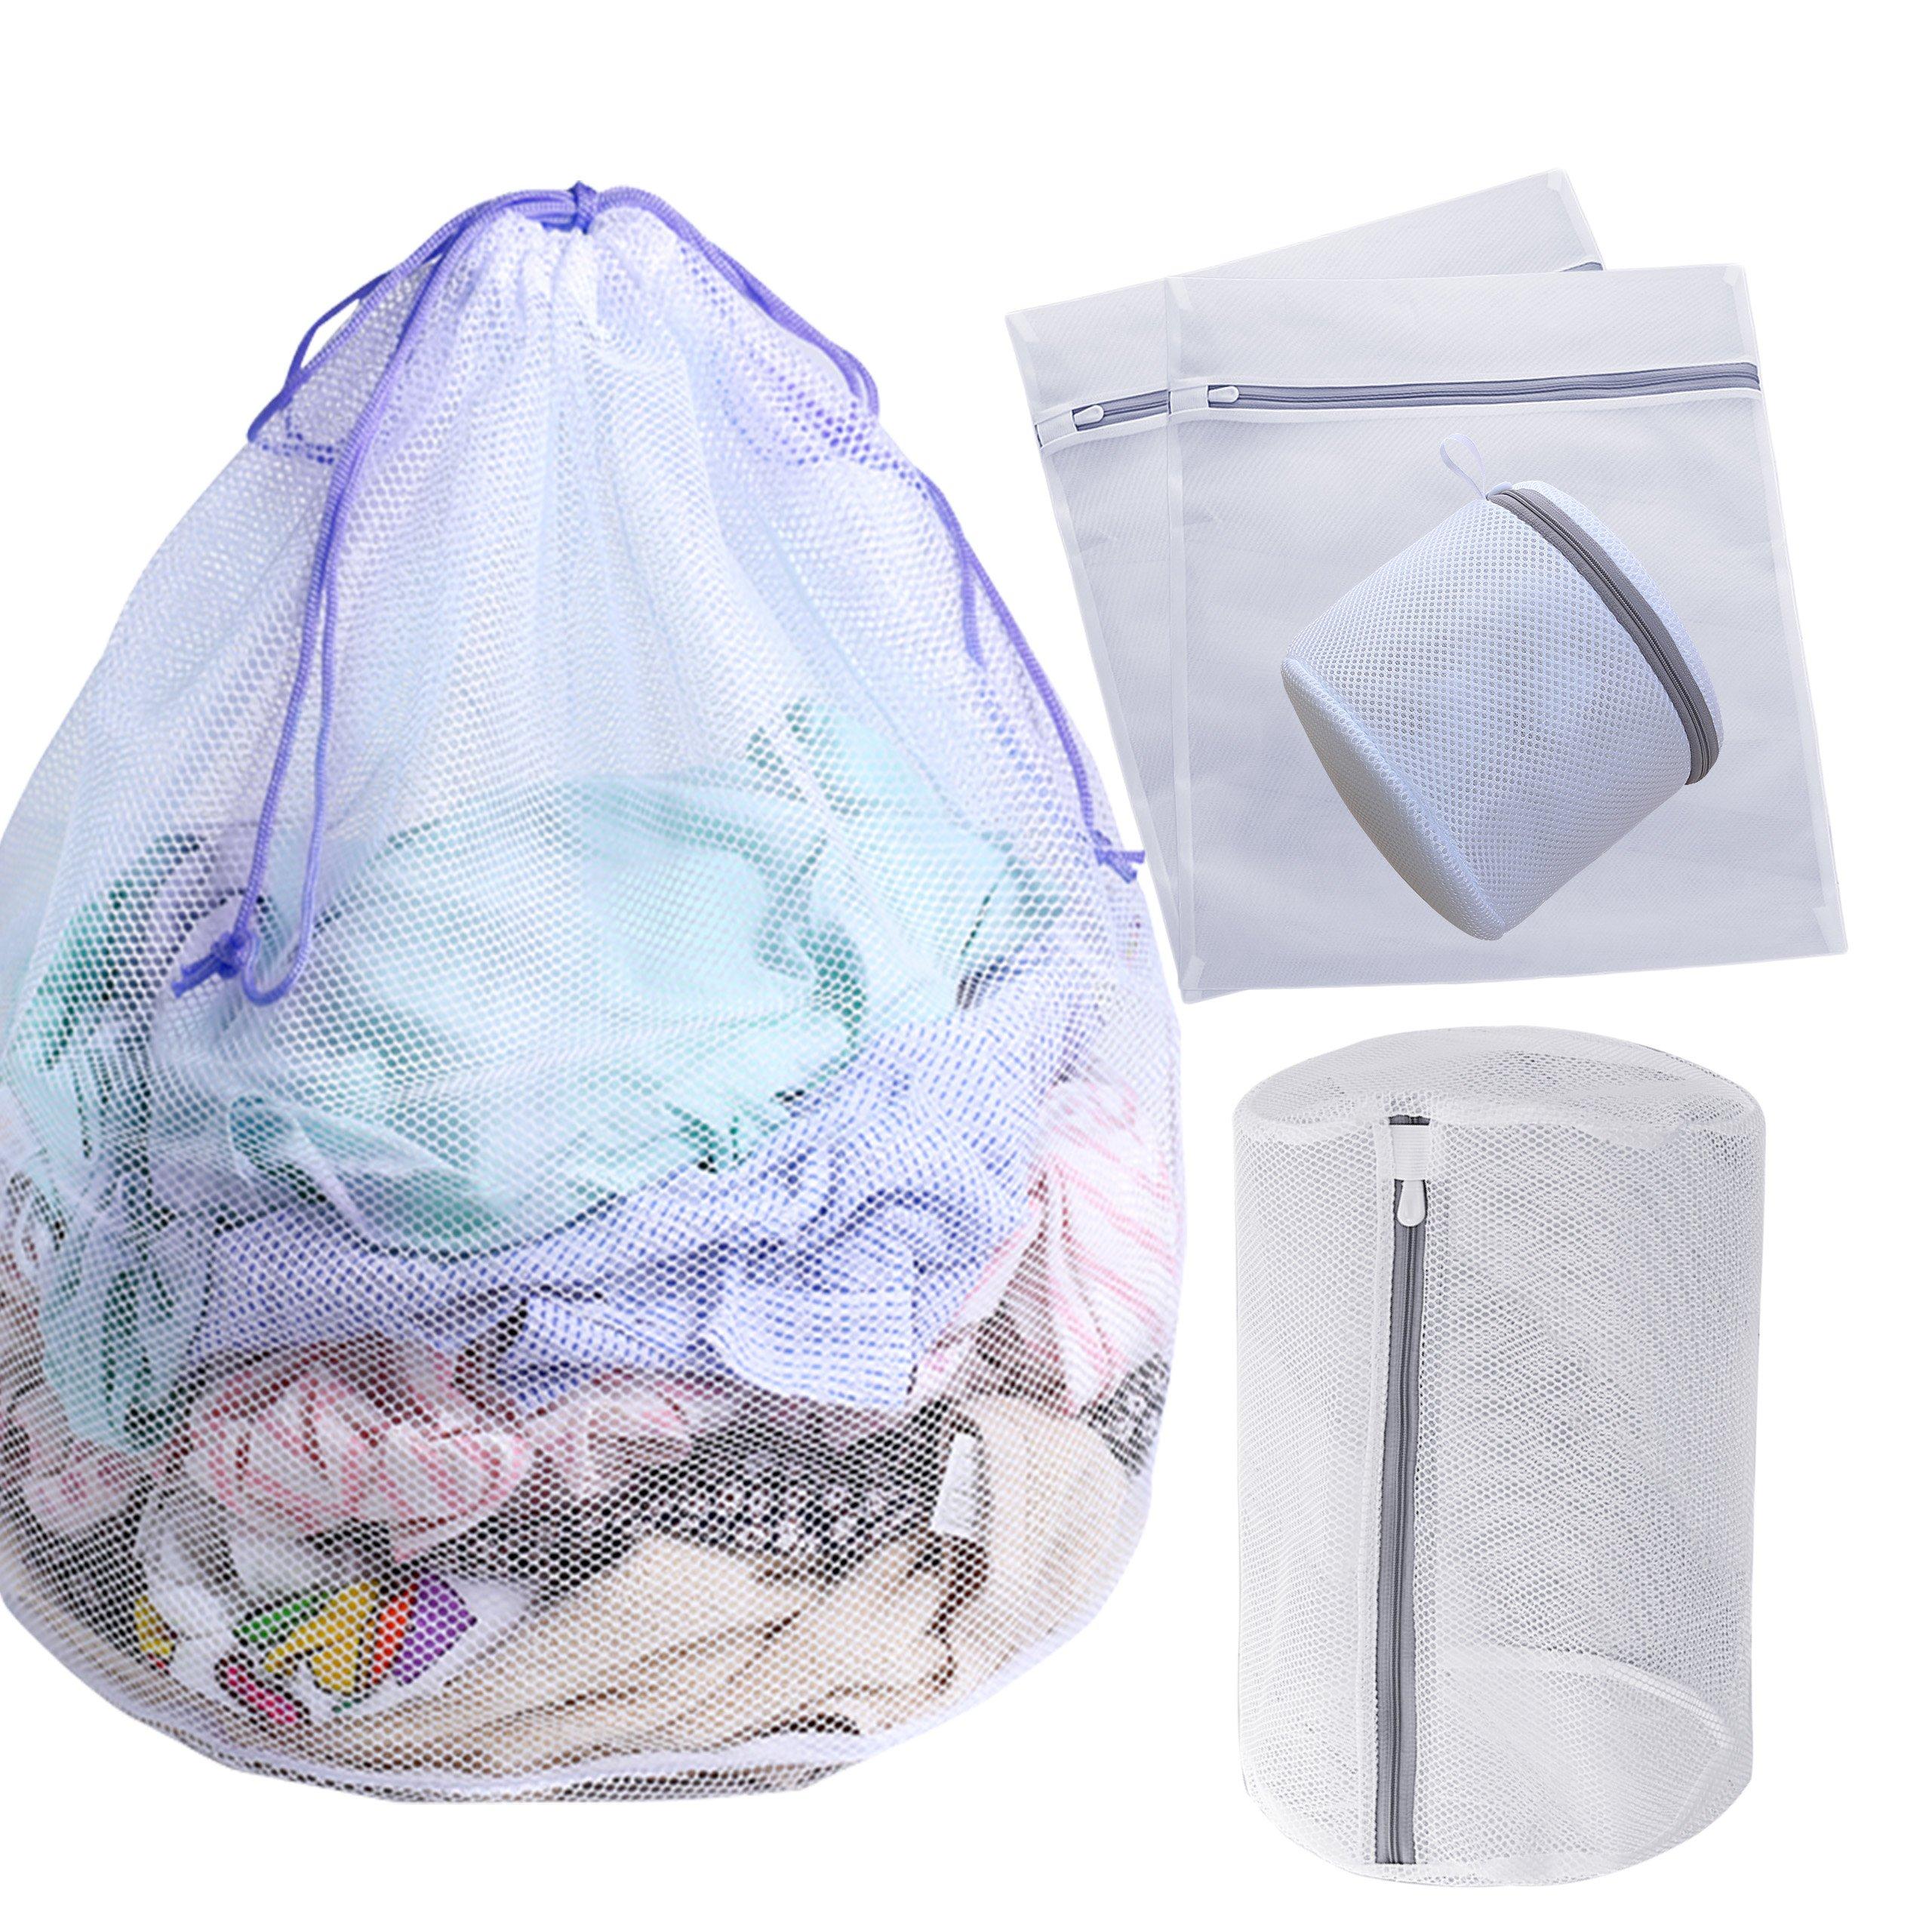 Set of 5 Mesh Laundry Bags-1 Jumbo, 2 Large, 1 Medium and 1 Mini Laundry Wash Bags for Coat, Jackets, Sweaters, Undies, Bras, Children Socks,Blouse, Hosiery, Lingerie (Jumbo Size Looser Mesh)